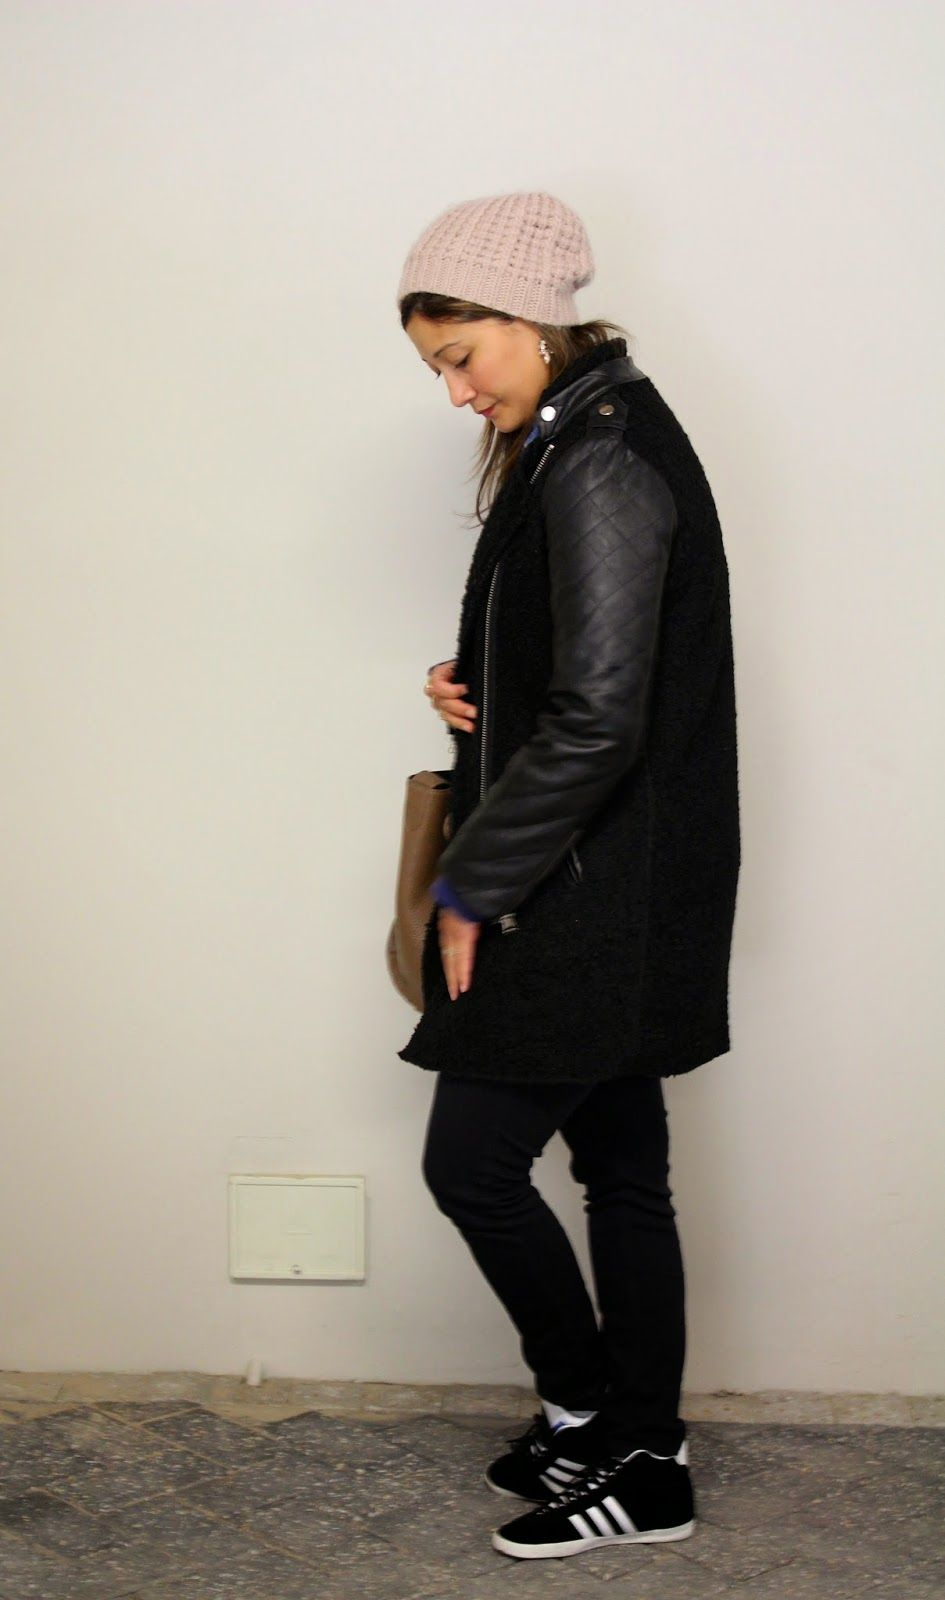 RuBe's Closet: Winter coat, all black